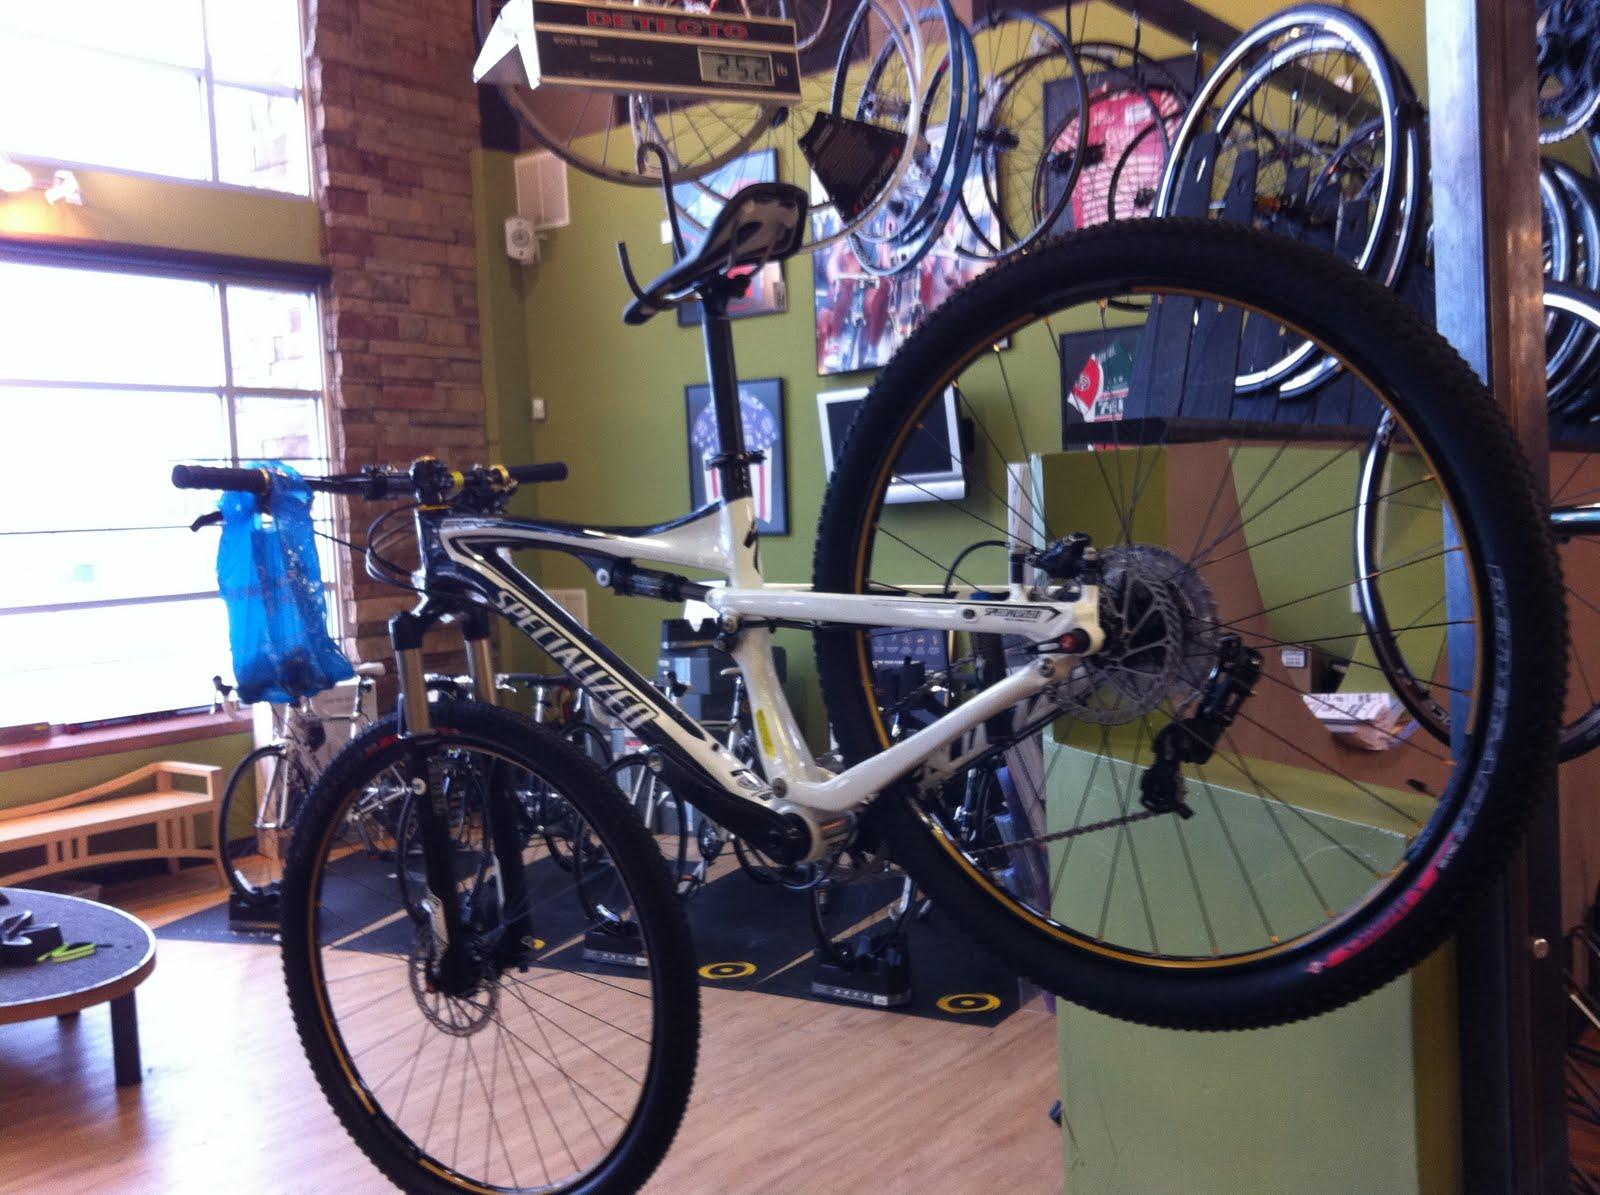 http://4.bp.blogspot.com/_gFM1zyLfYTA/TUsPQT8ZV6I/AAAAAAAAAg0/bKE79z8xdDs/s1600/bike.jpg